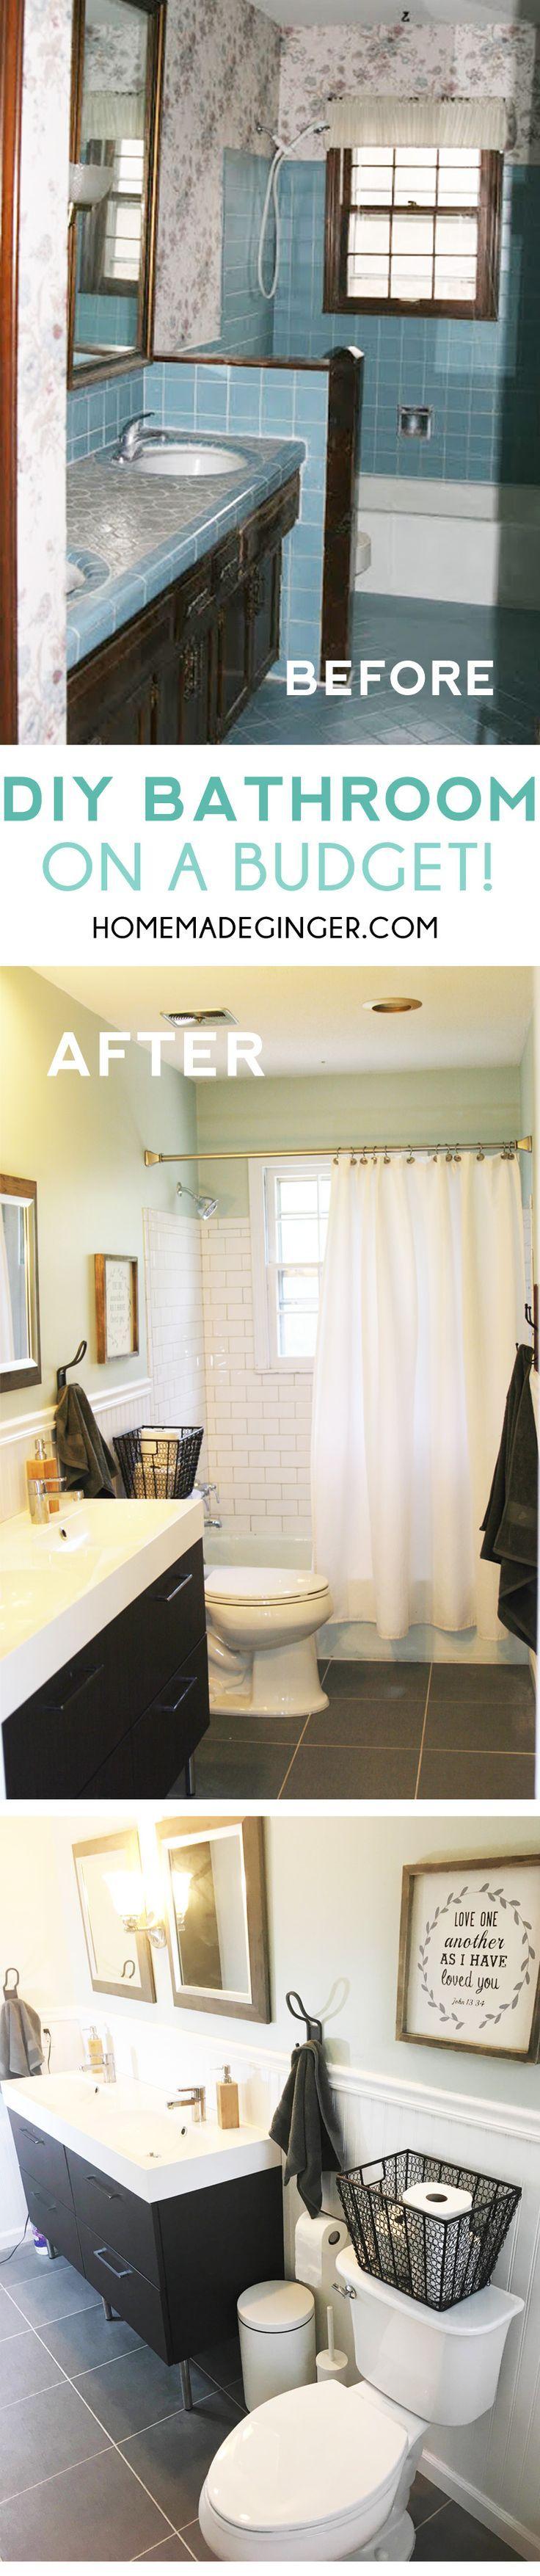 149 best Small Bathroom Ideas images on Pinterest